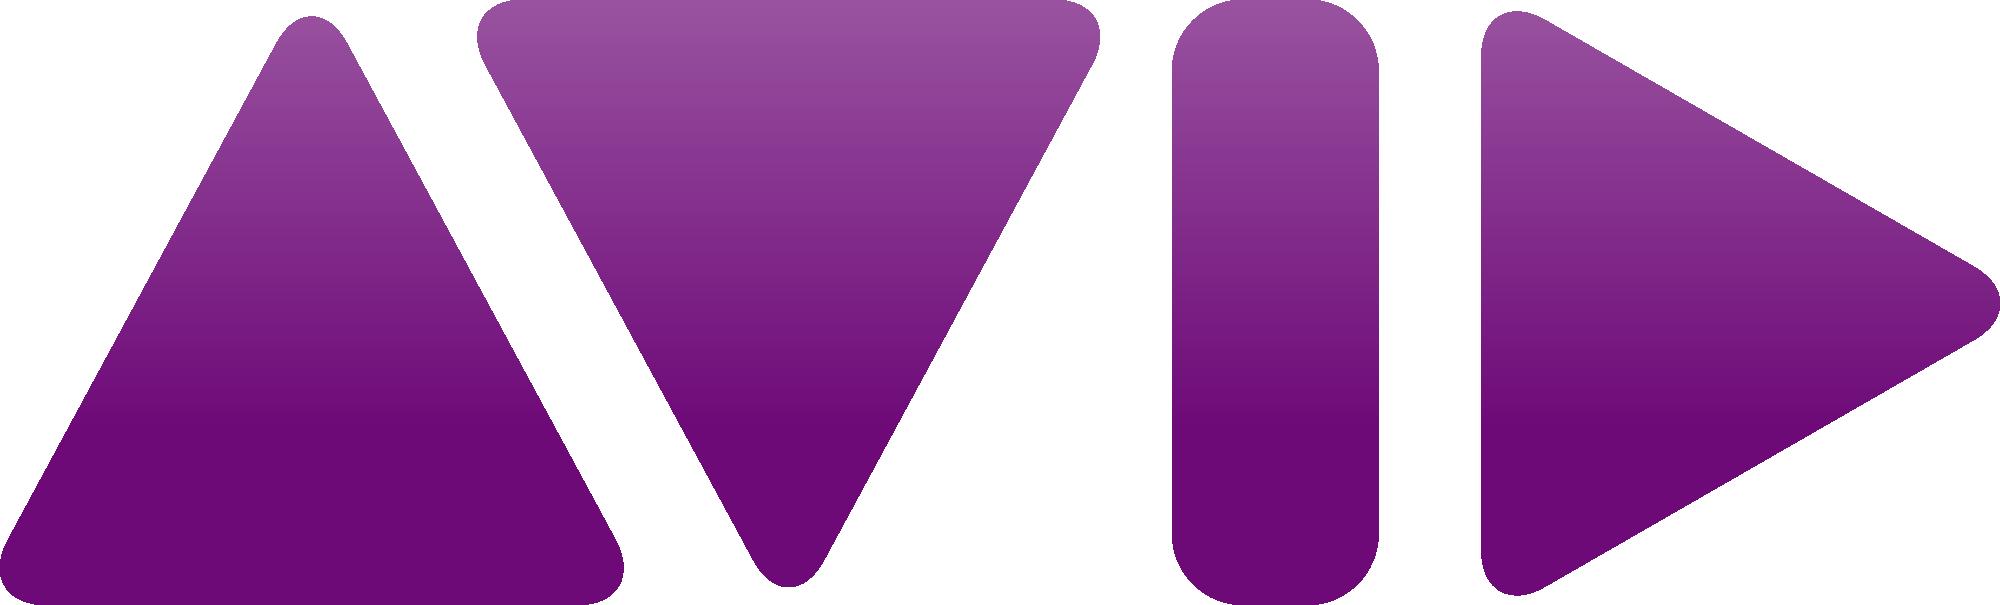 Avid Technology, Inc. (AVID)